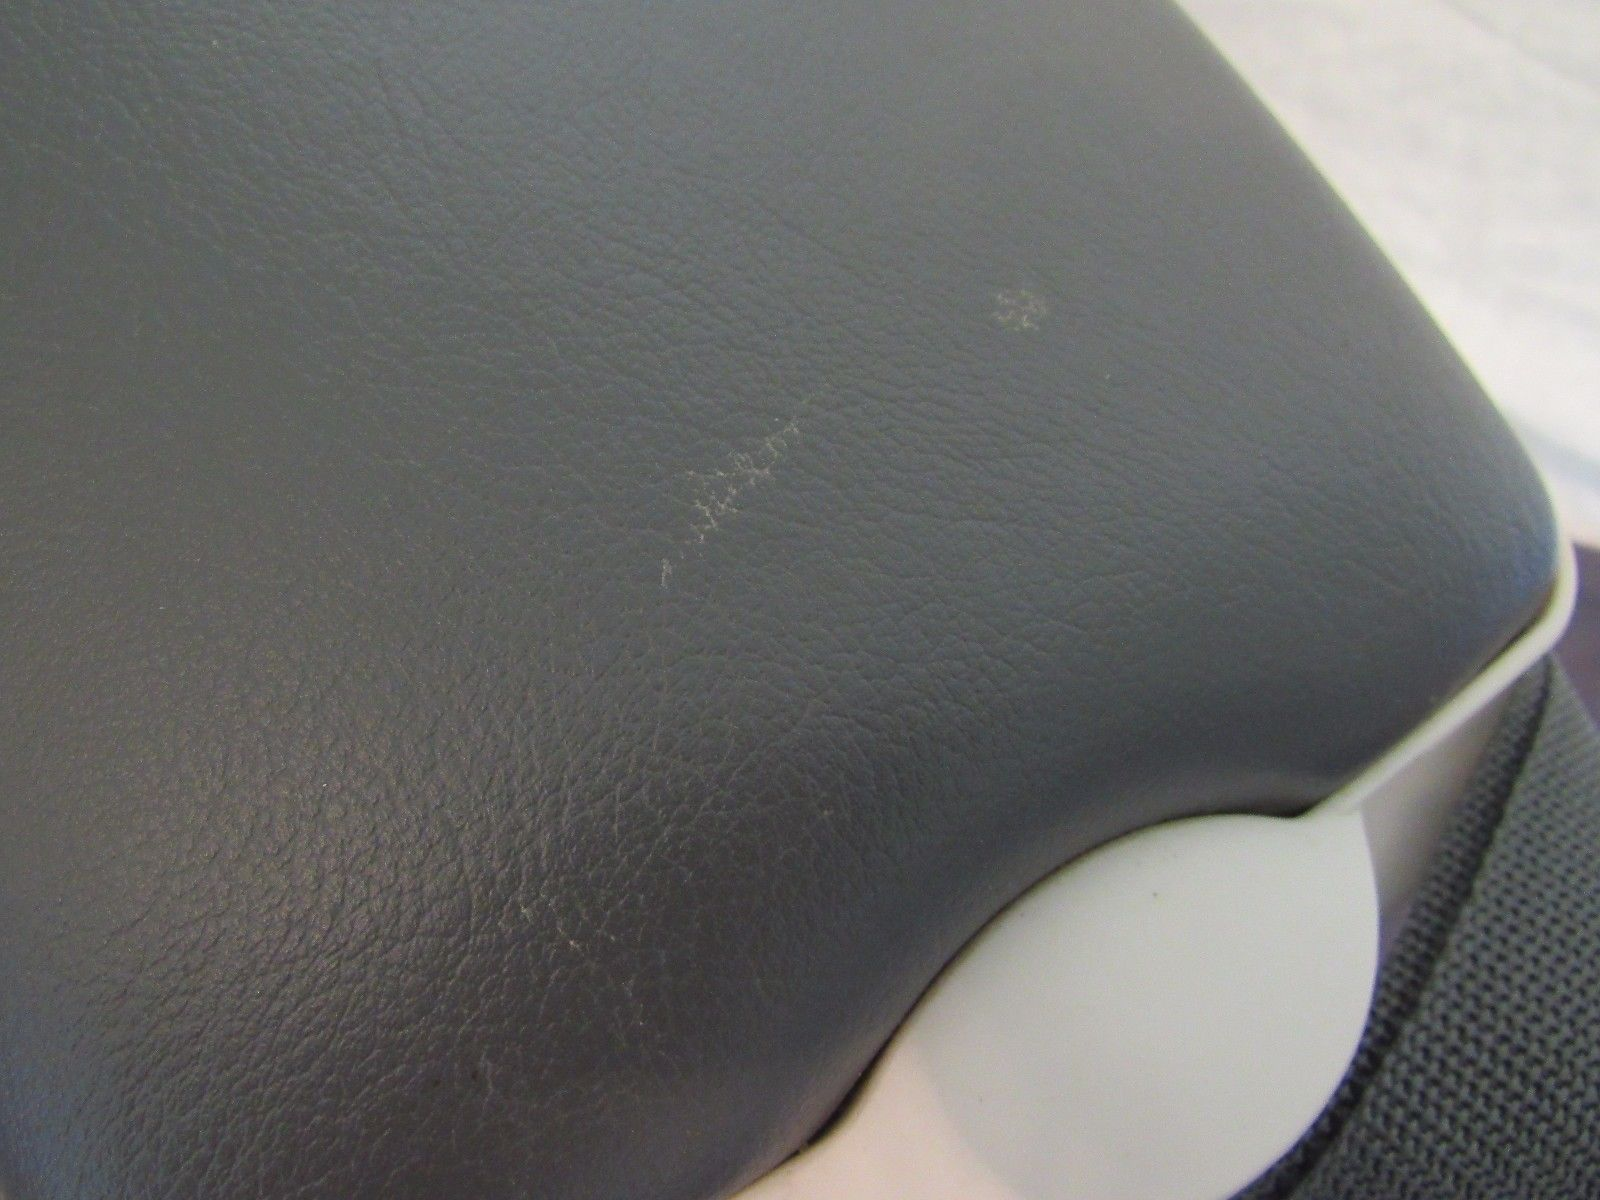 JohnLite JML3802 Travel Cooler Warmer Good Working Condition